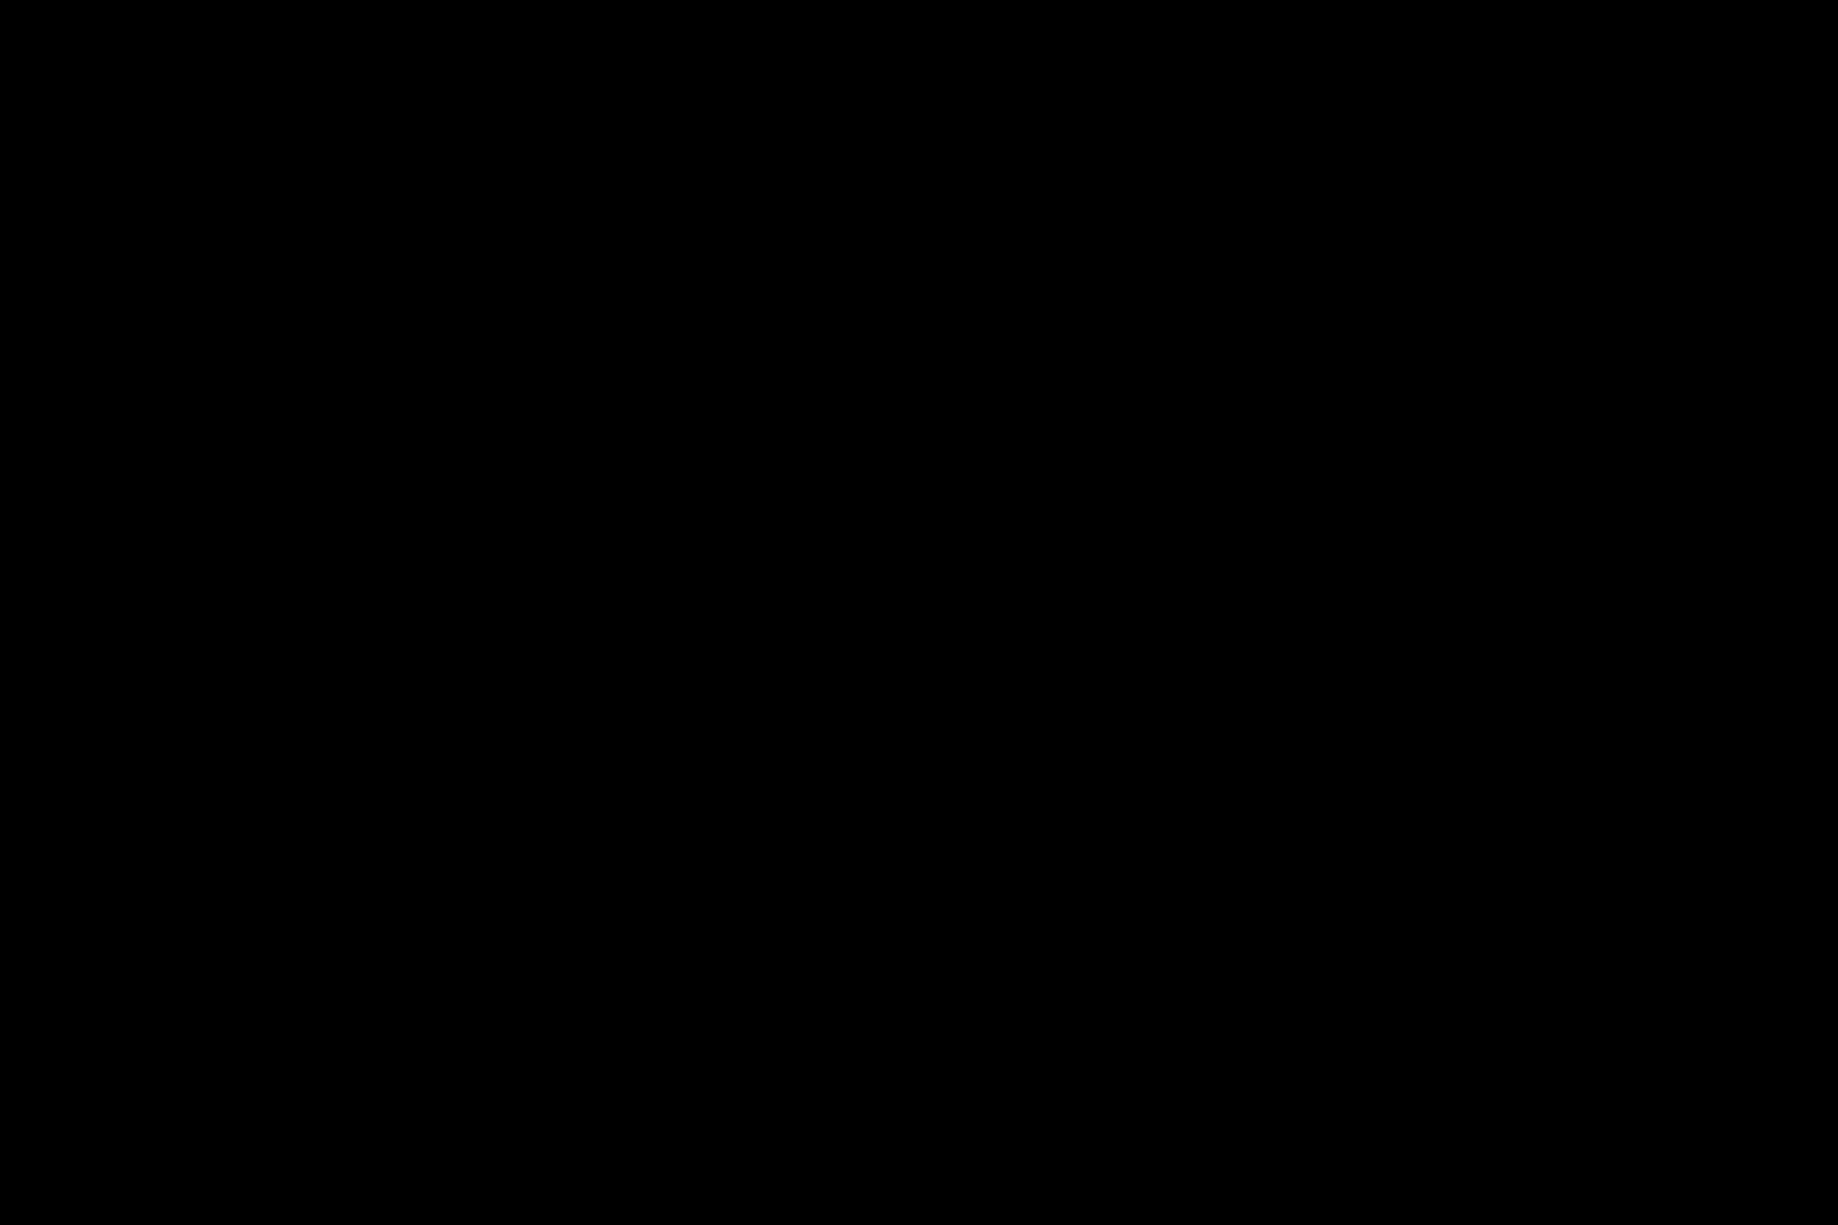 EASTHAMPTON WINTERFEST: CRAFT FAIR